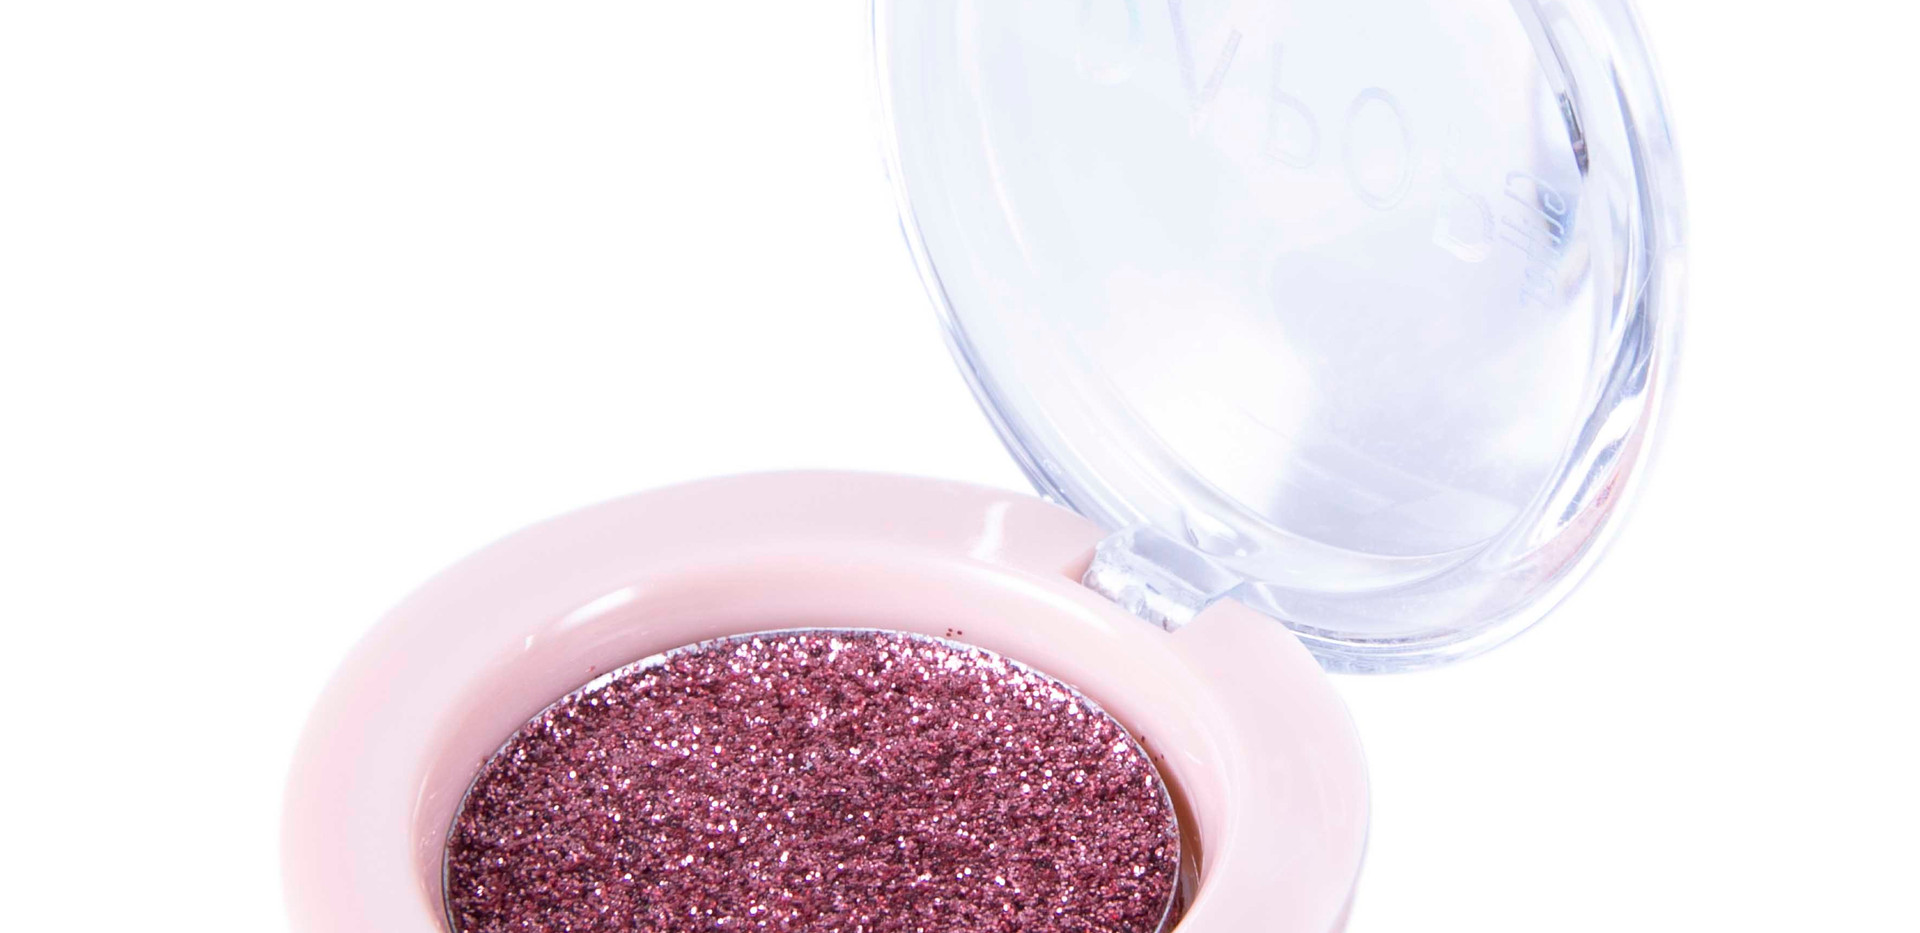 Glitter Prensado Dapop - HB96972 (2)